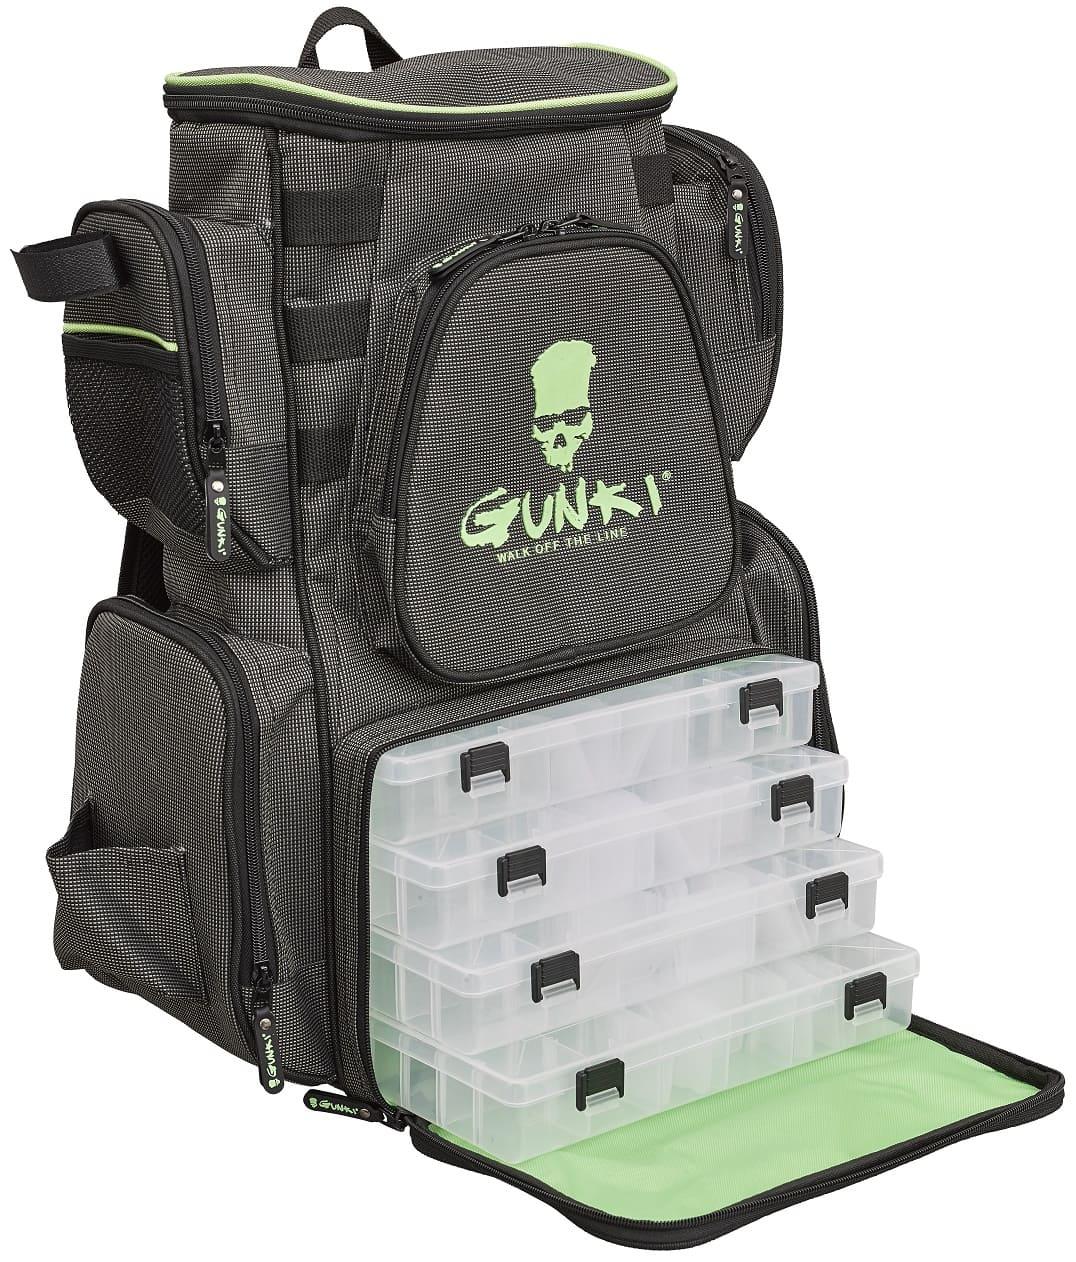 Gunki Iron-T Backpack (batoh)